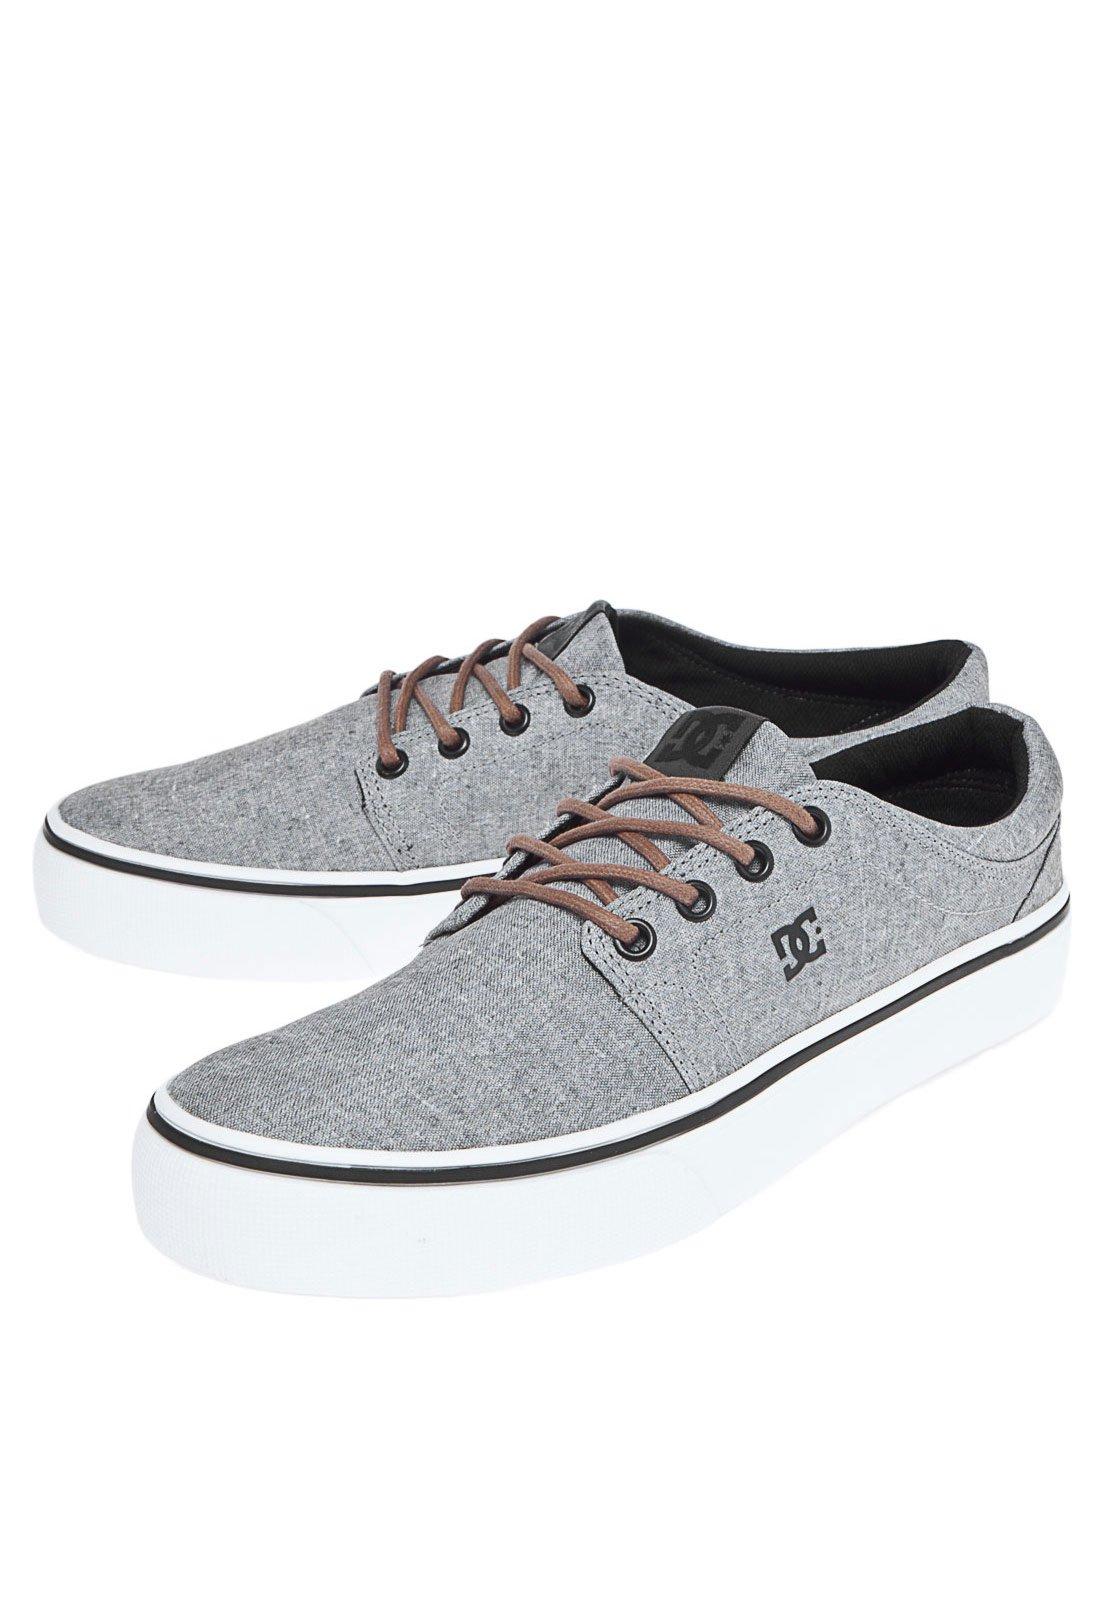 Tênis DC Shoes Trase Tx Se Cinza - Compre Agora  e4a4bf7b4990a